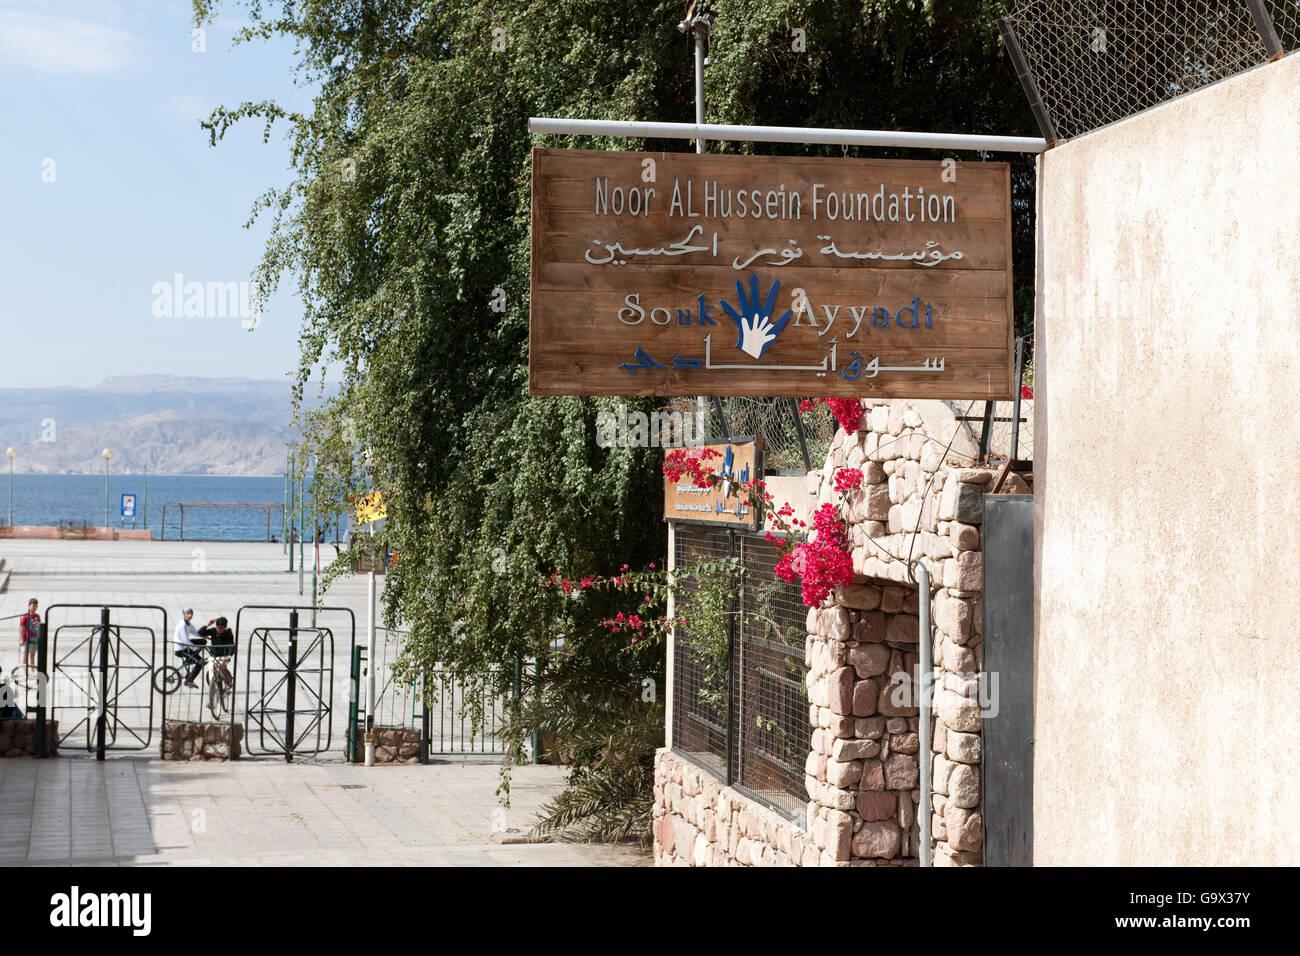 Noor Al Hussein Foundation, museum entrance, Souk, Aqaba, Jordan, Minor Asia / Akaba - Stock Image